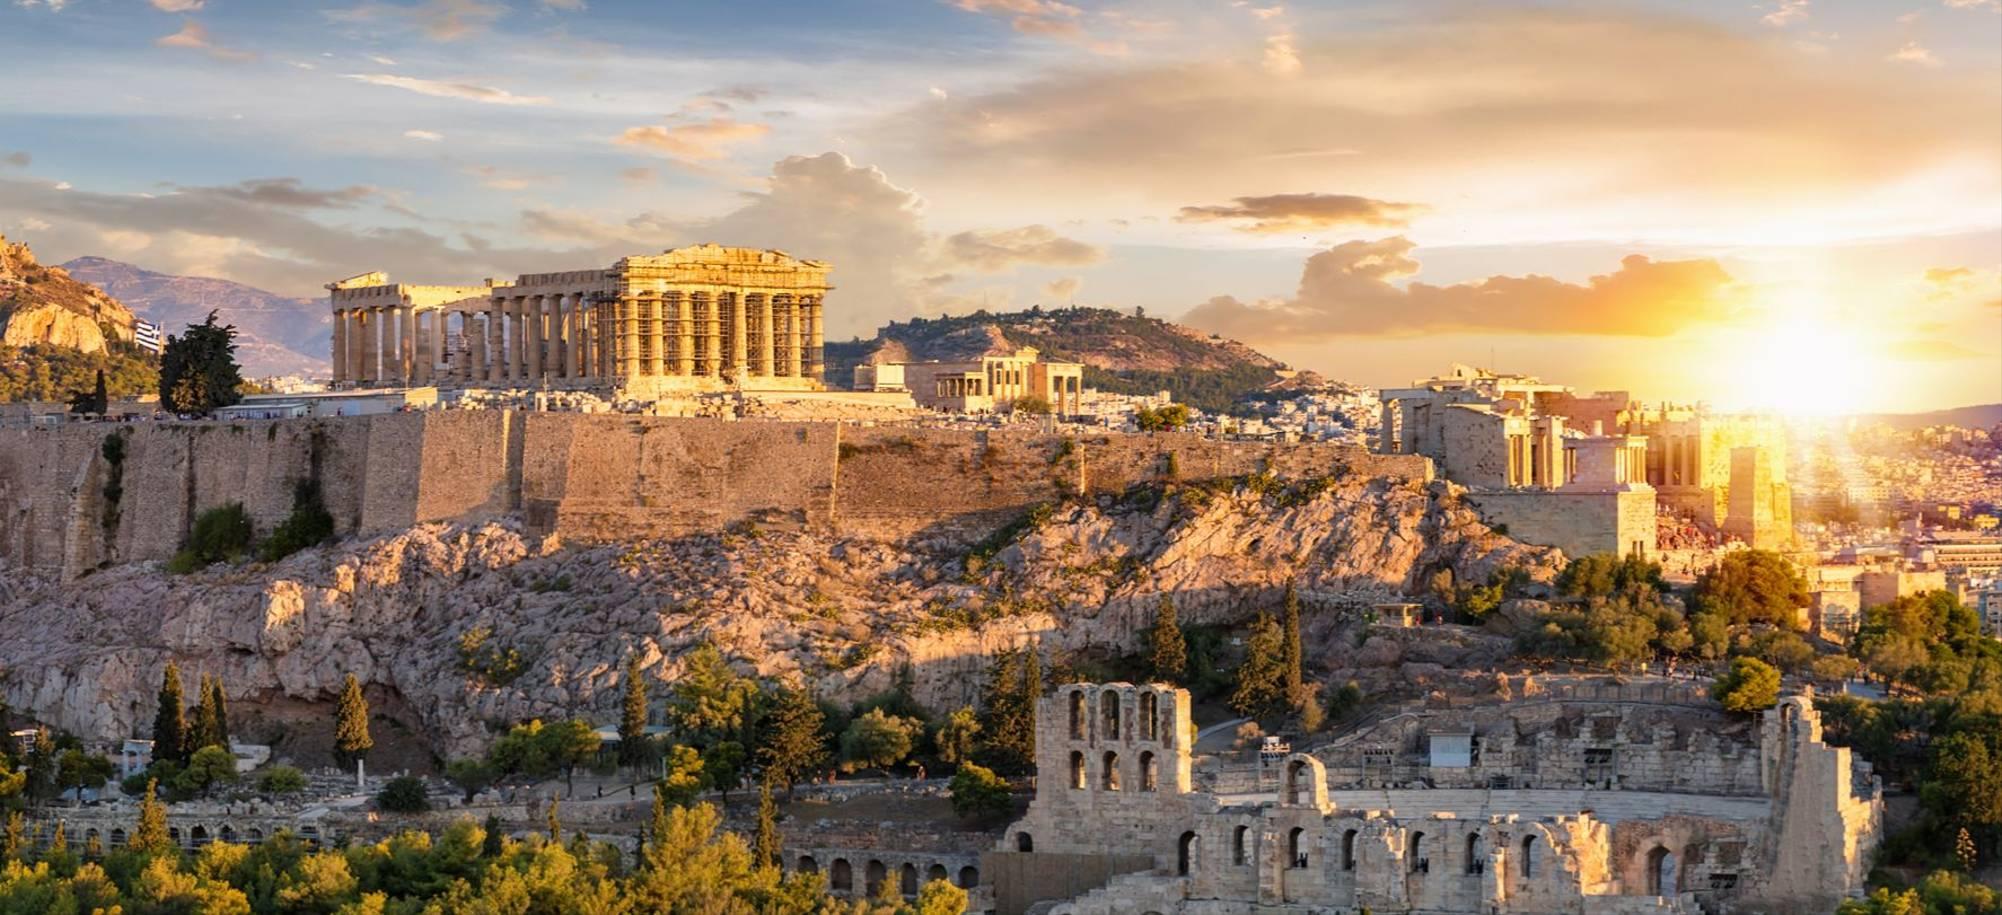 Athens   Acropolis Skyline   Itinerary Desktop